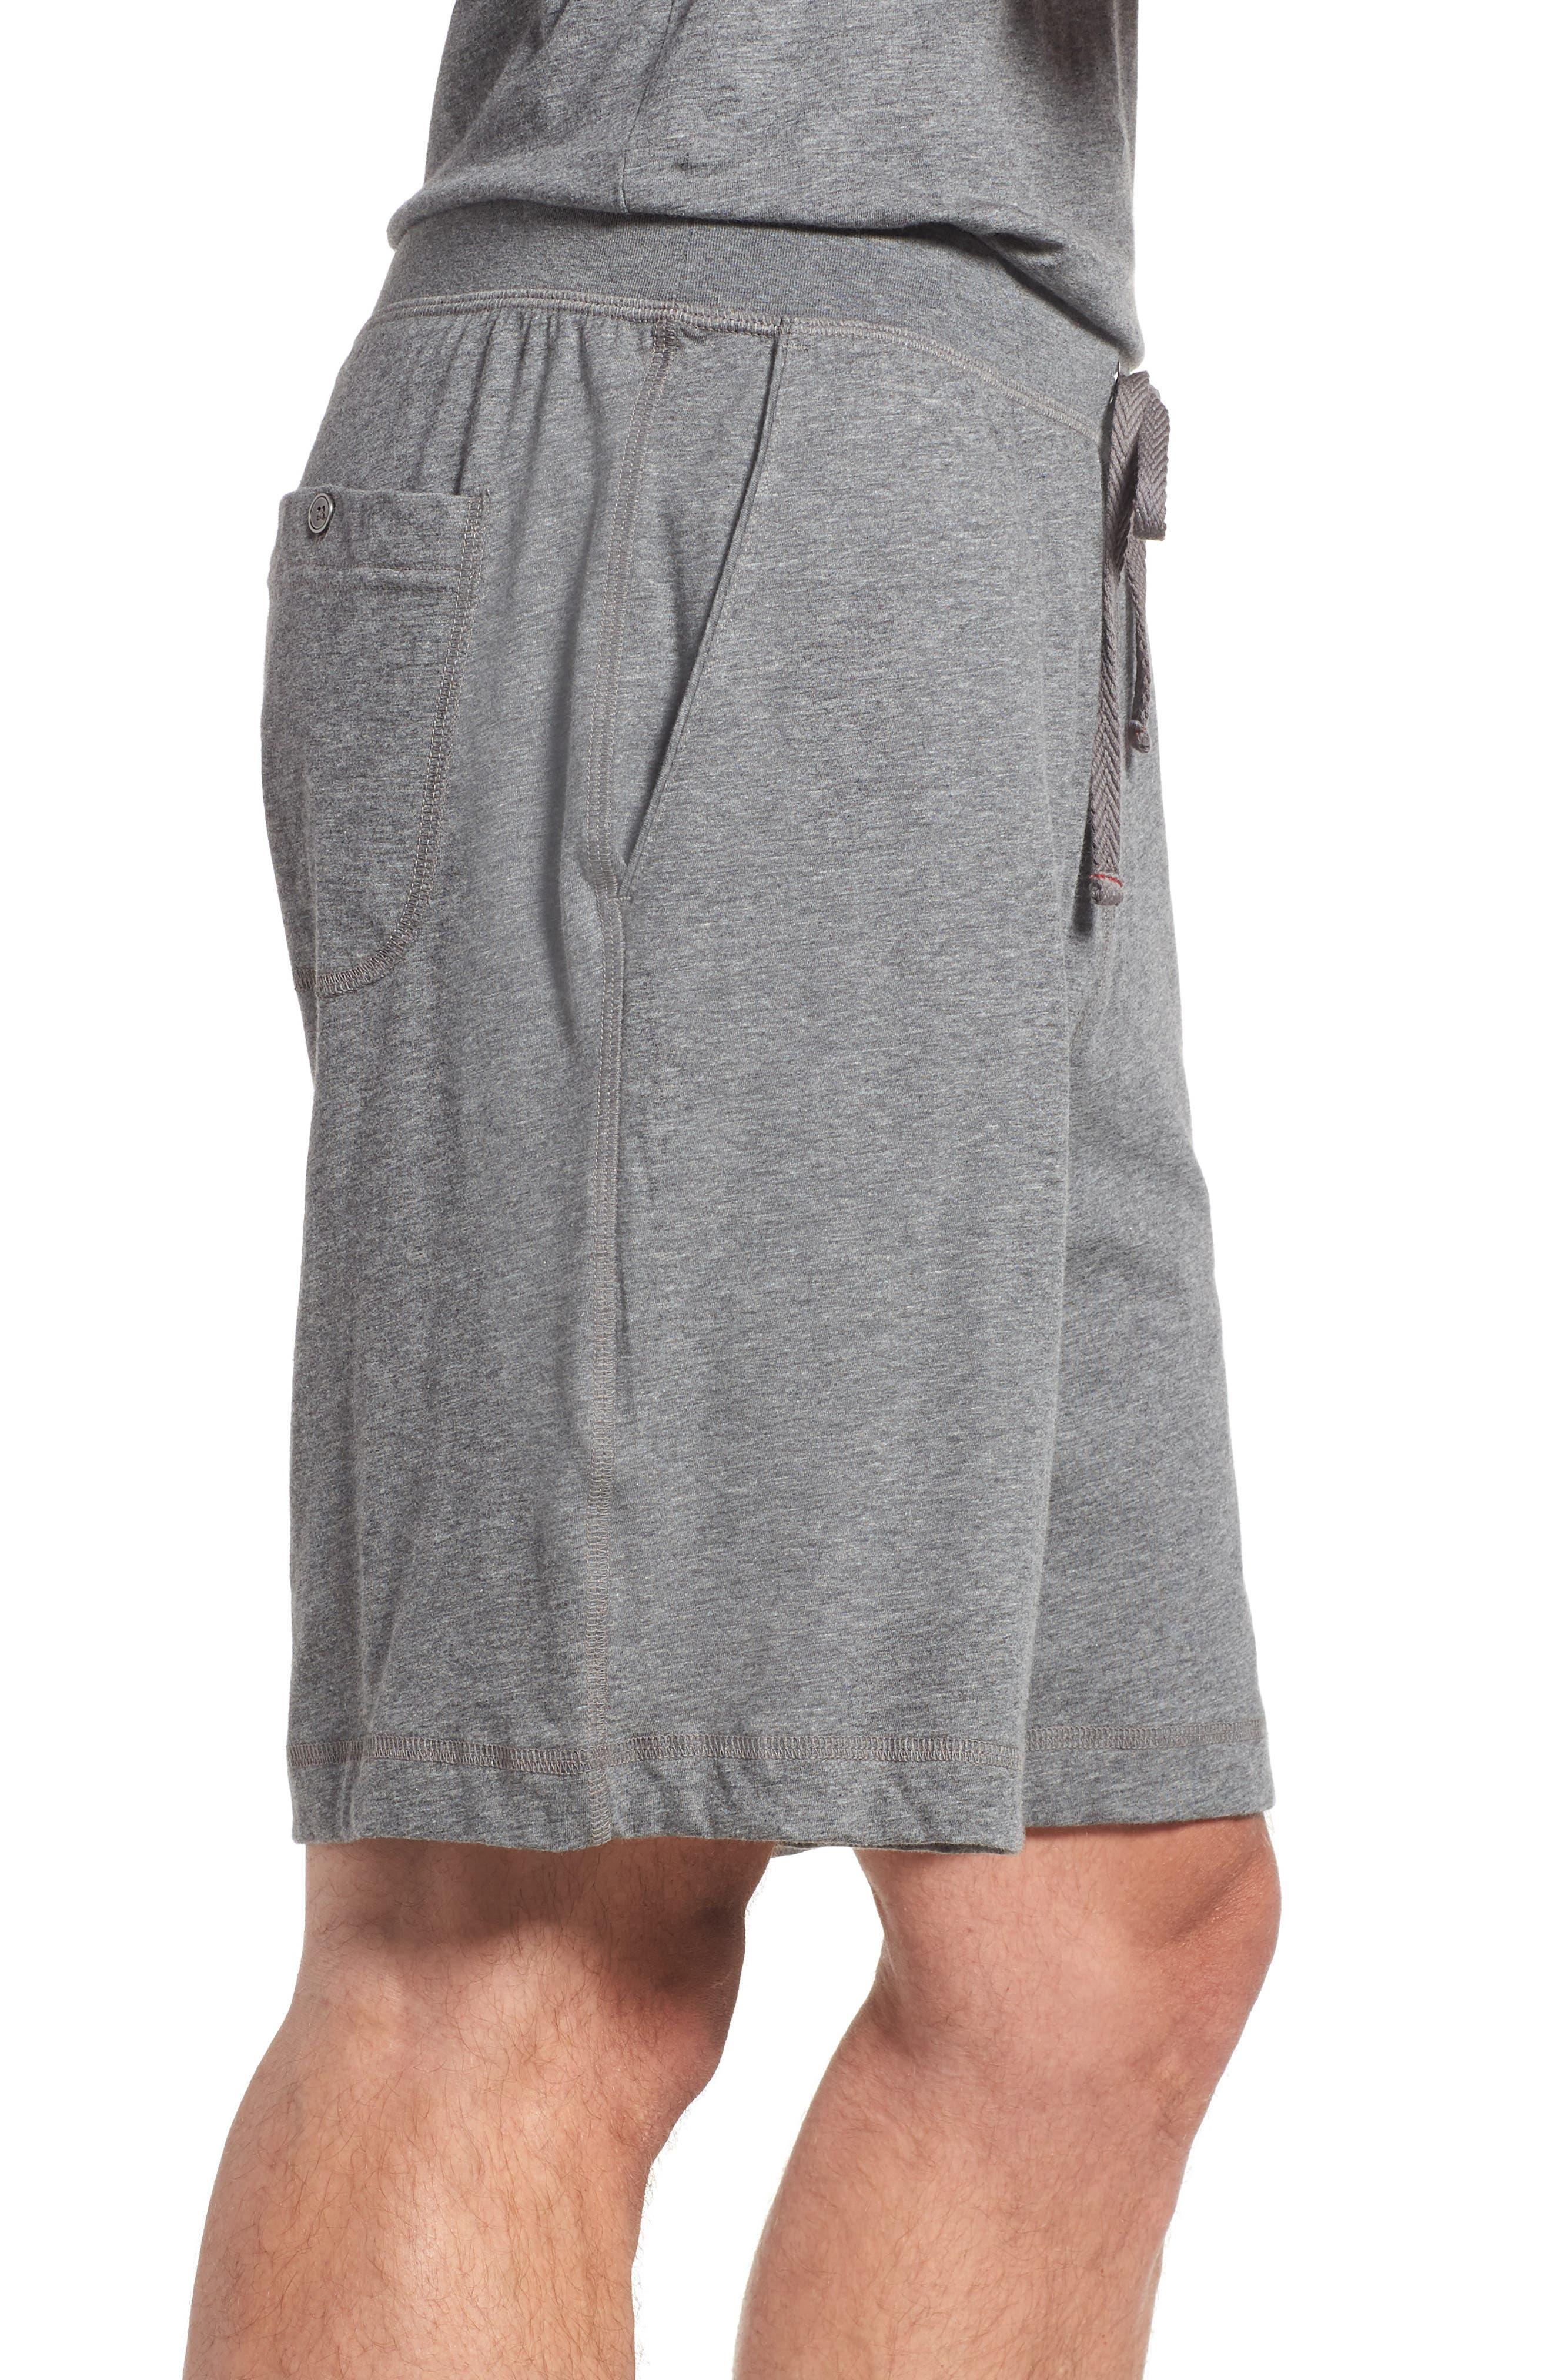 Pima Cotton Lounge Shorts,                             Alternate thumbnail 3, color,                             CHARCOAL HEATHER